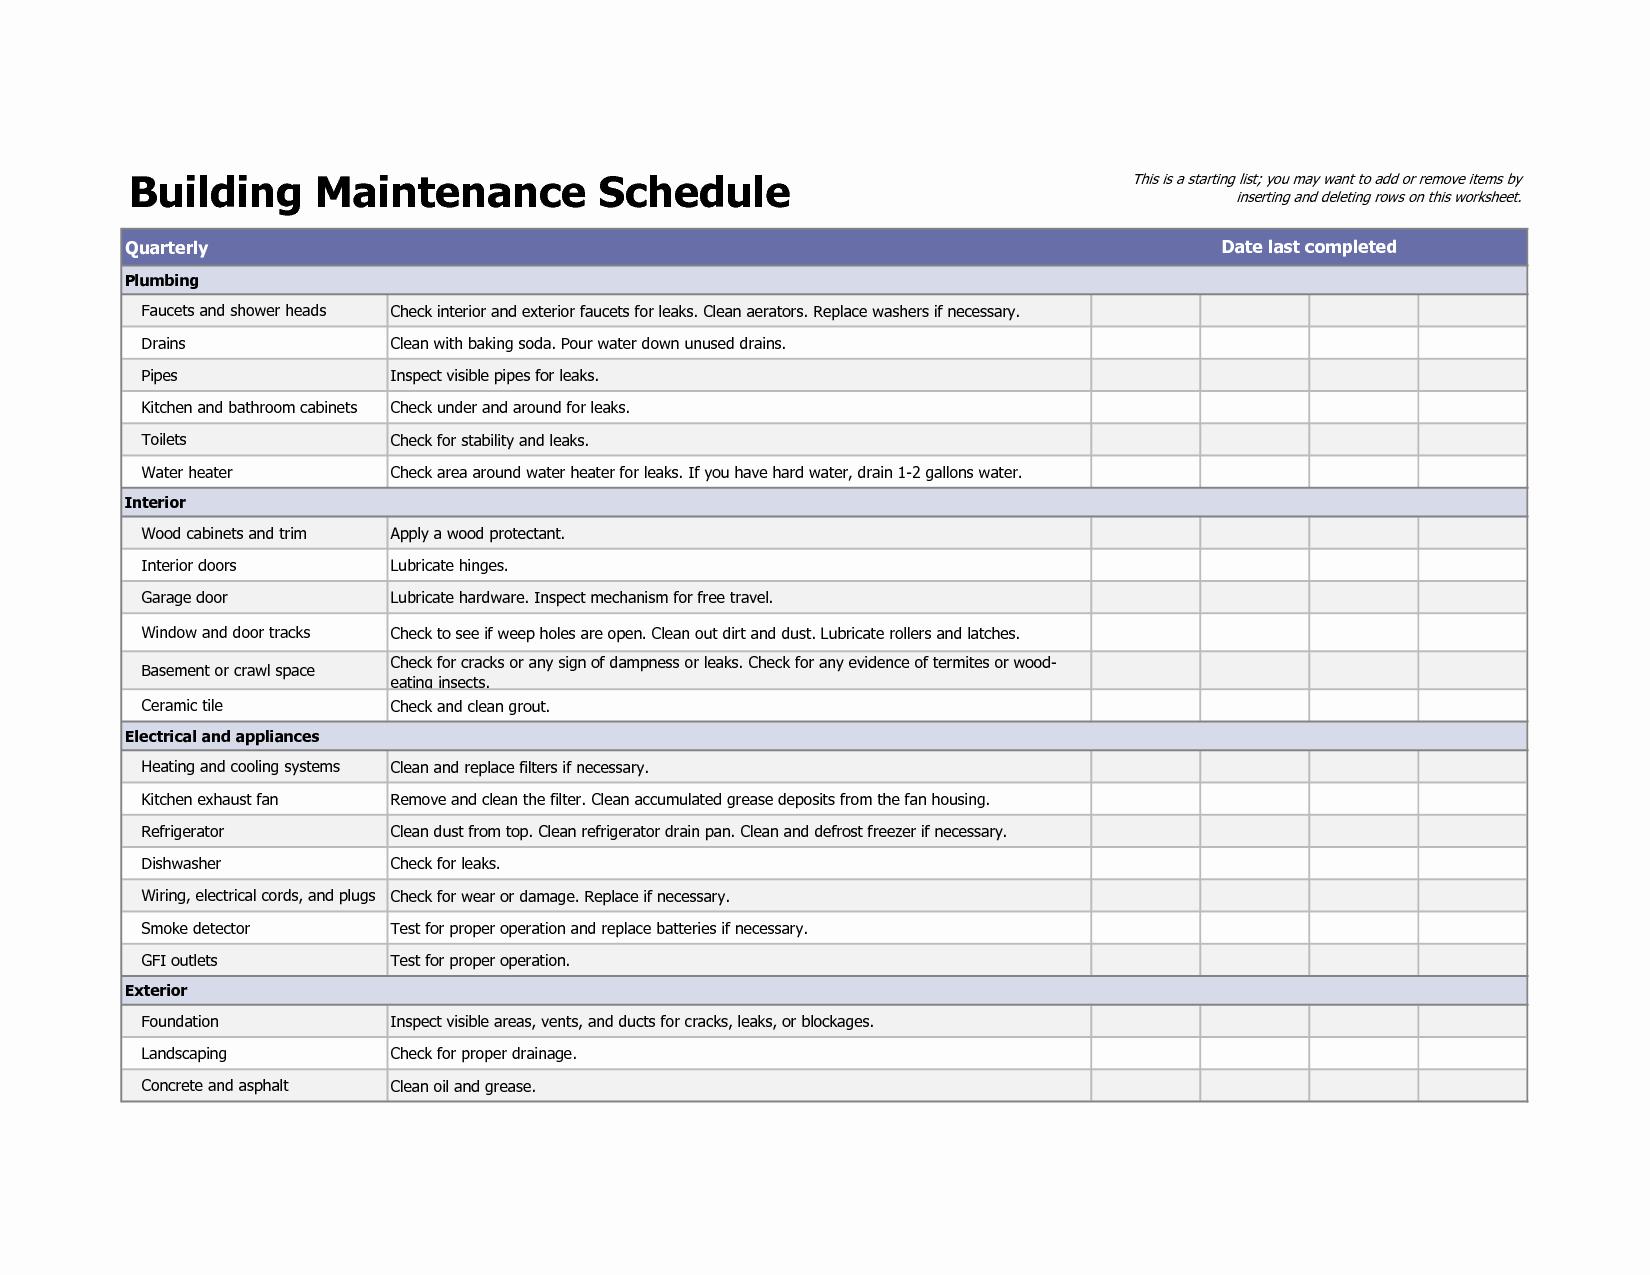 Preventive Maintenance Excel Template Lovely Building Maintenance Schedule Excel Template